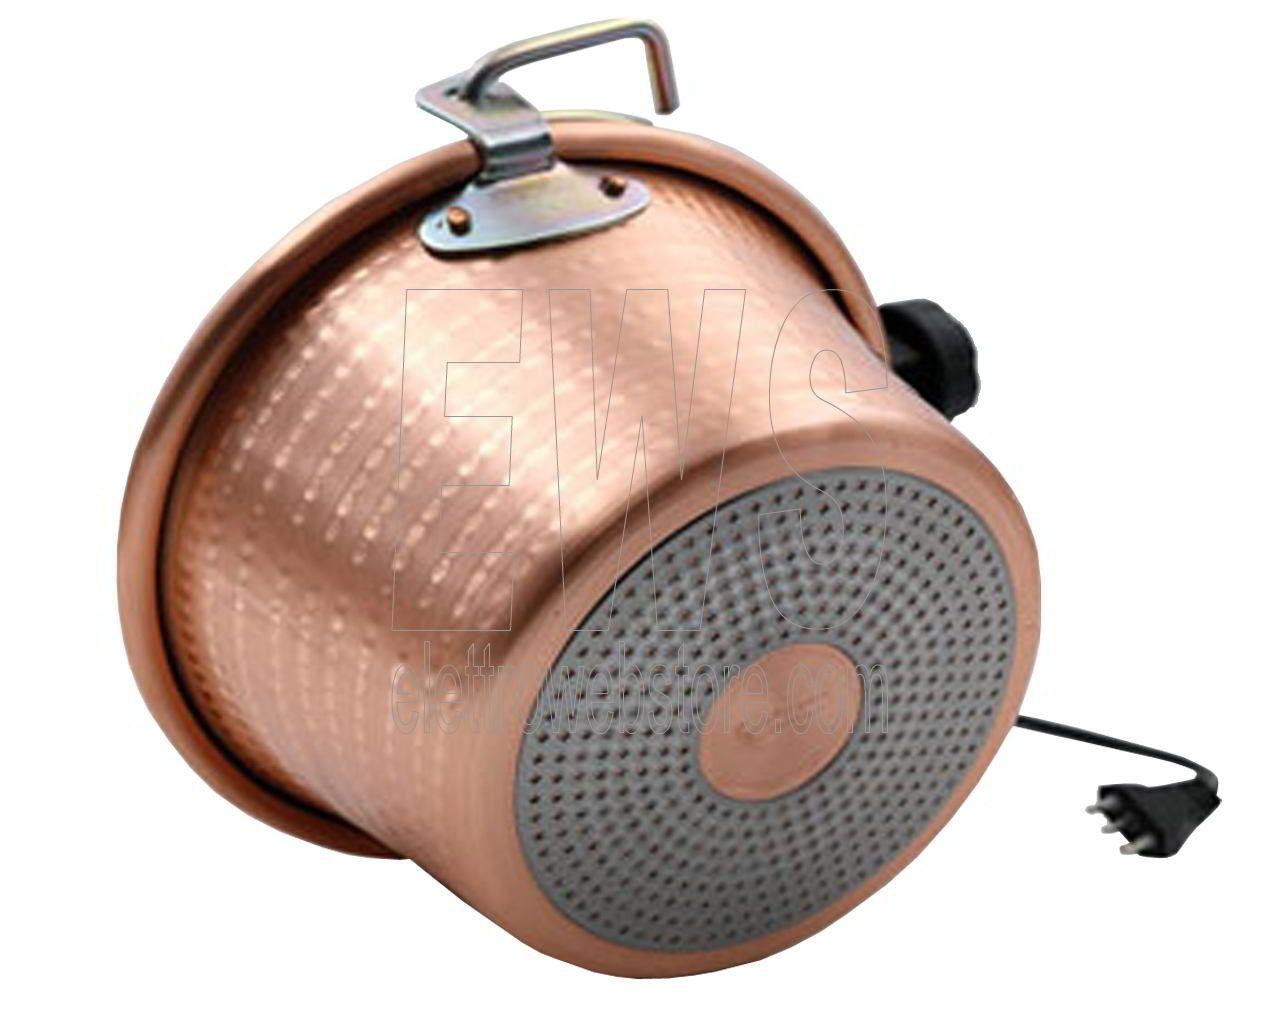 Botta Cuoca Automatica paiolo rame induzione 26 cm 4 litri 5 Watt